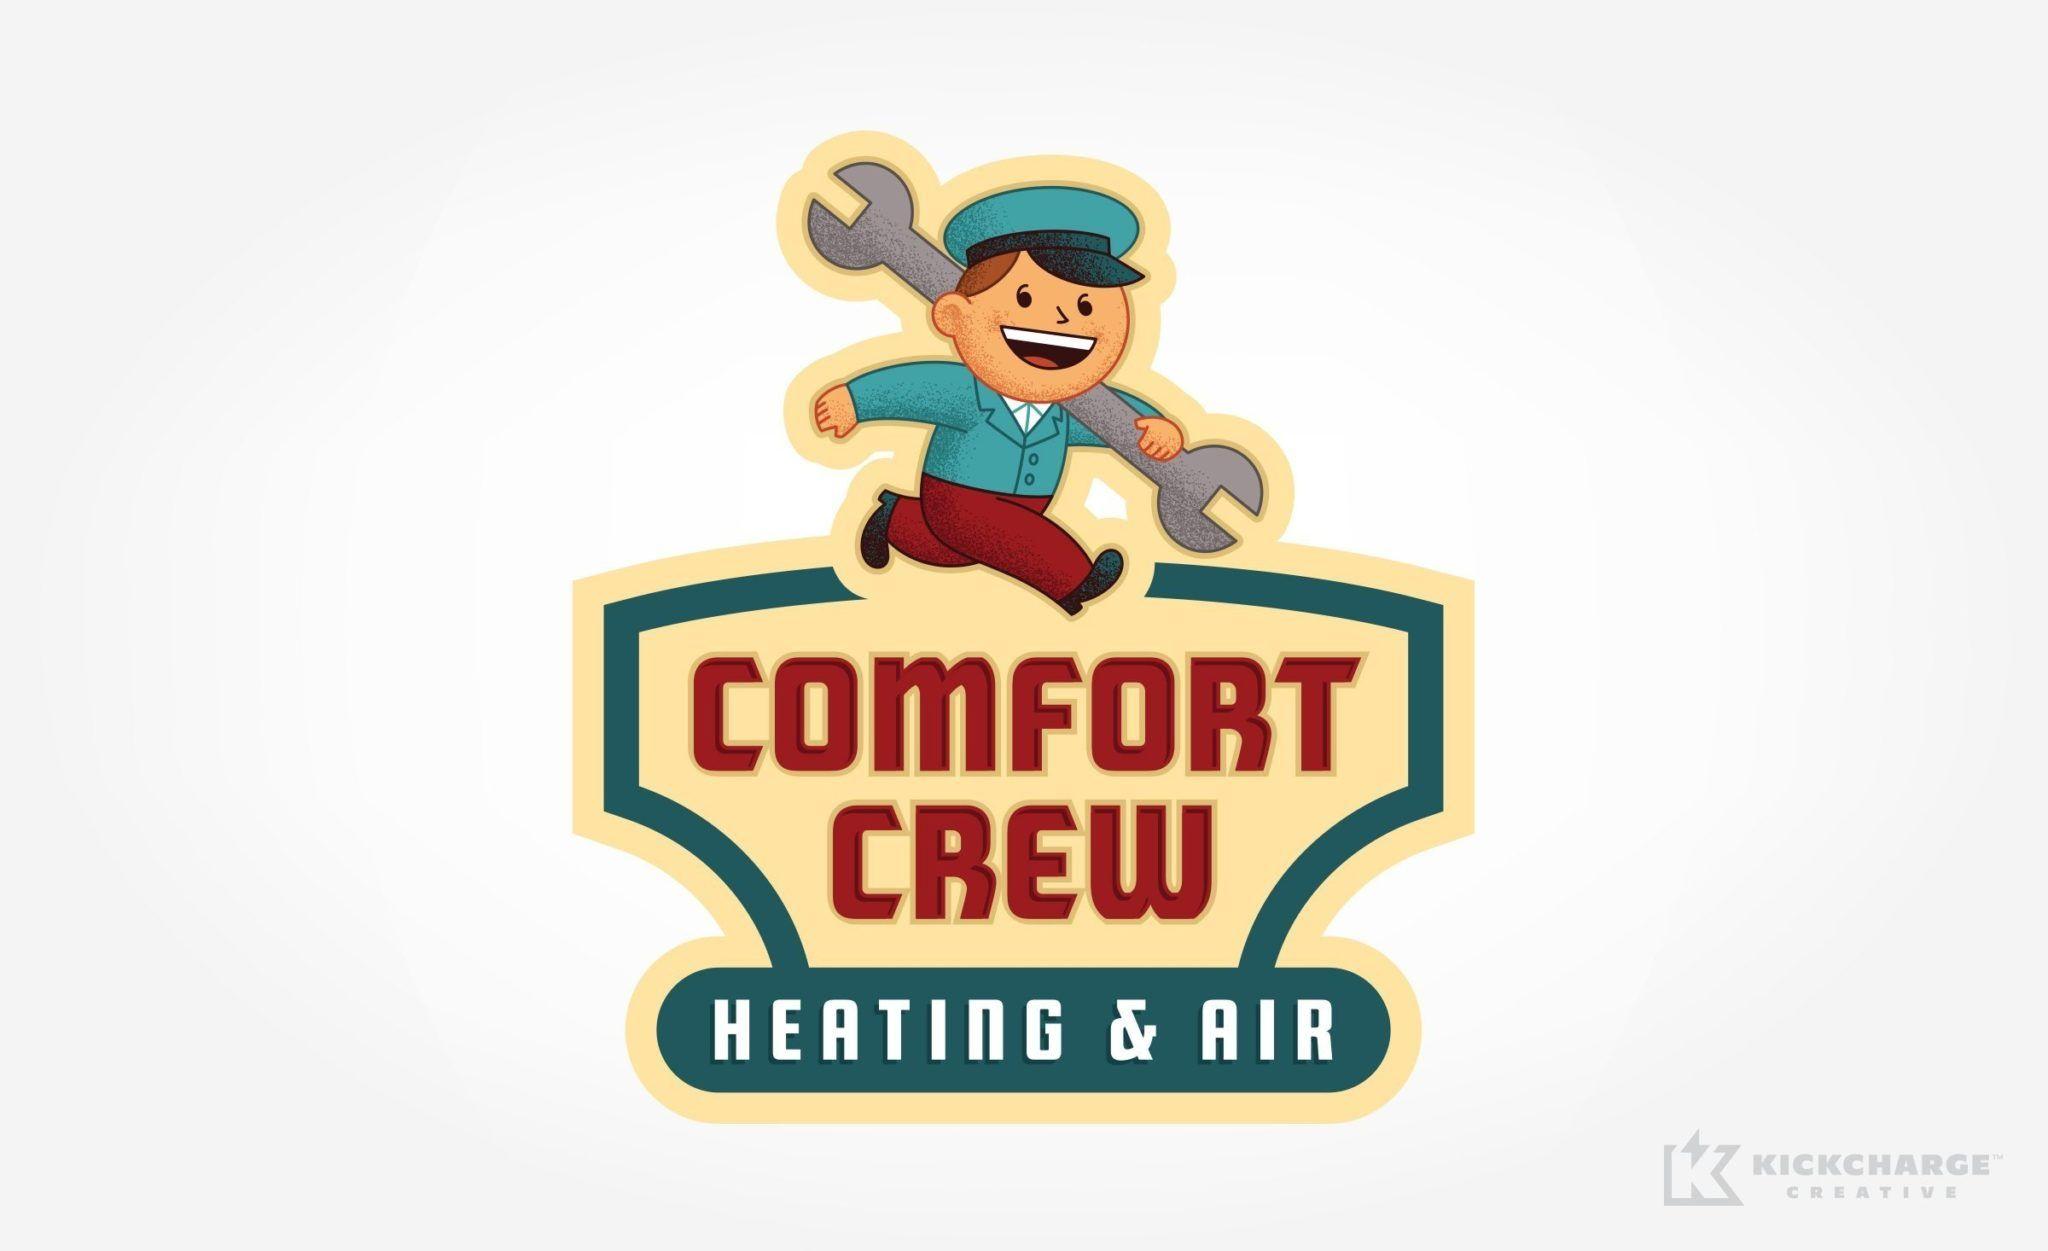 Comfort Crew Heating & Air KickCharge Creative (con